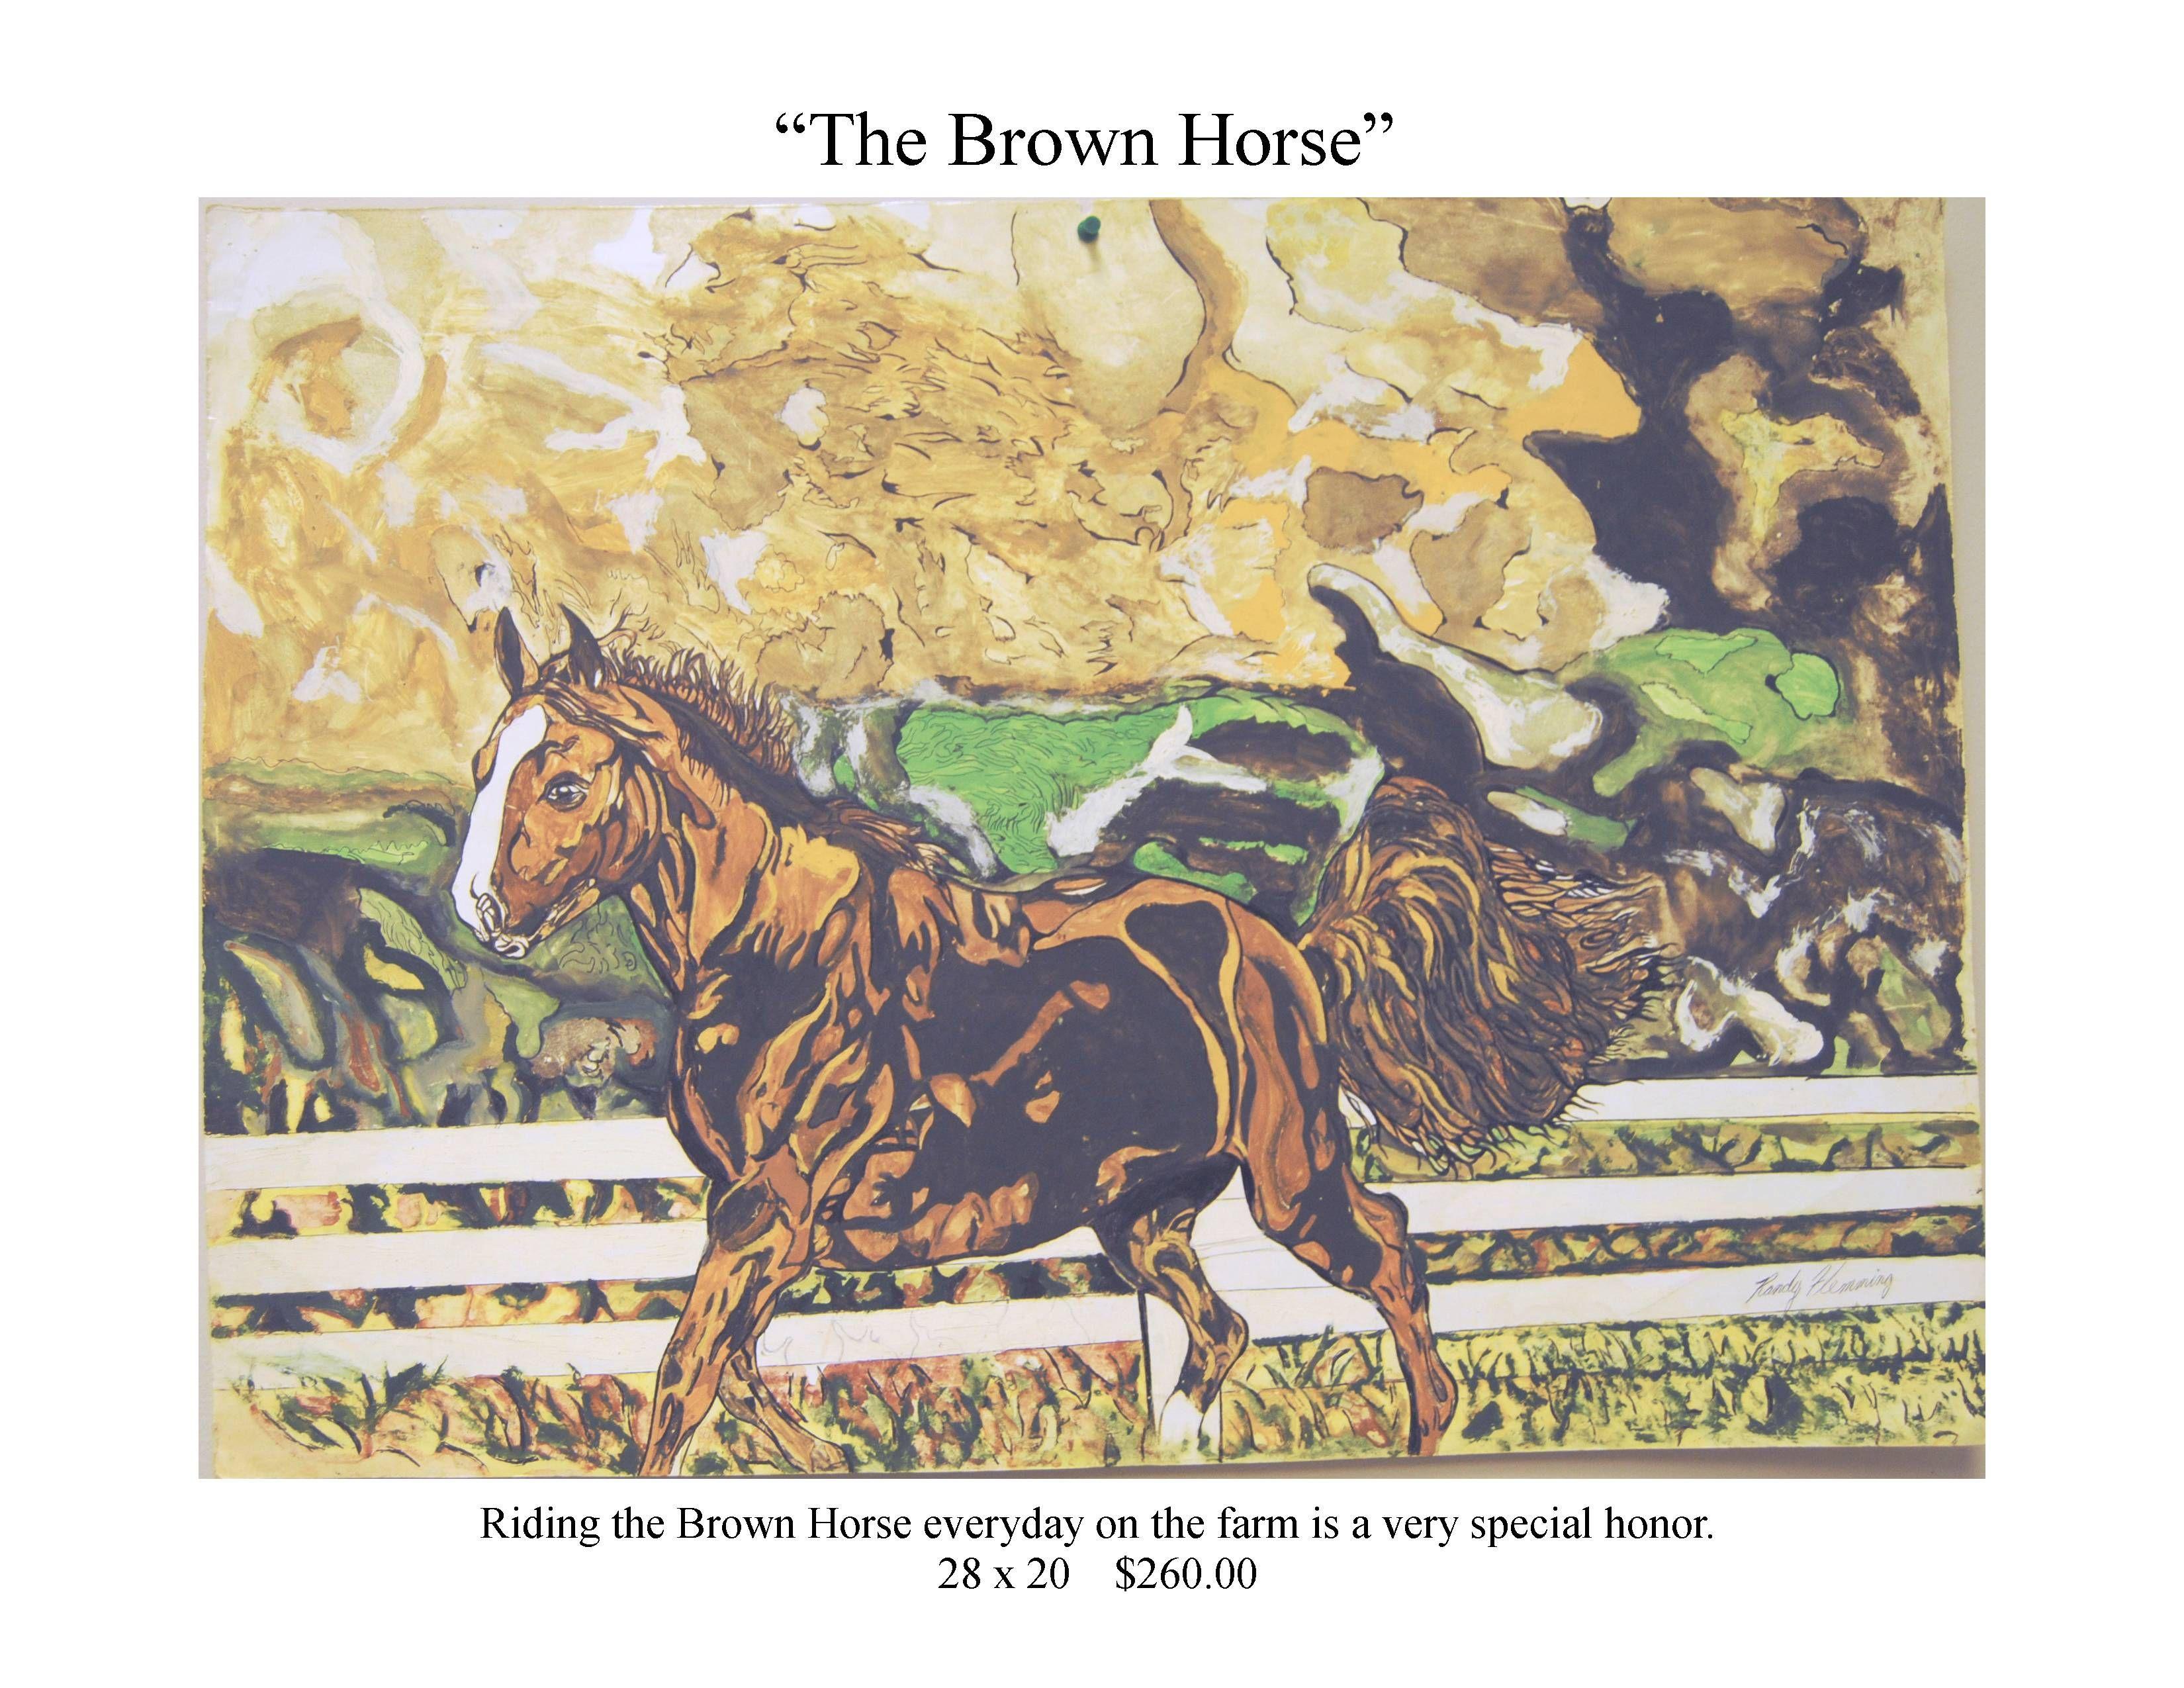 The-Brown-Horse.jpg (3300×2550)